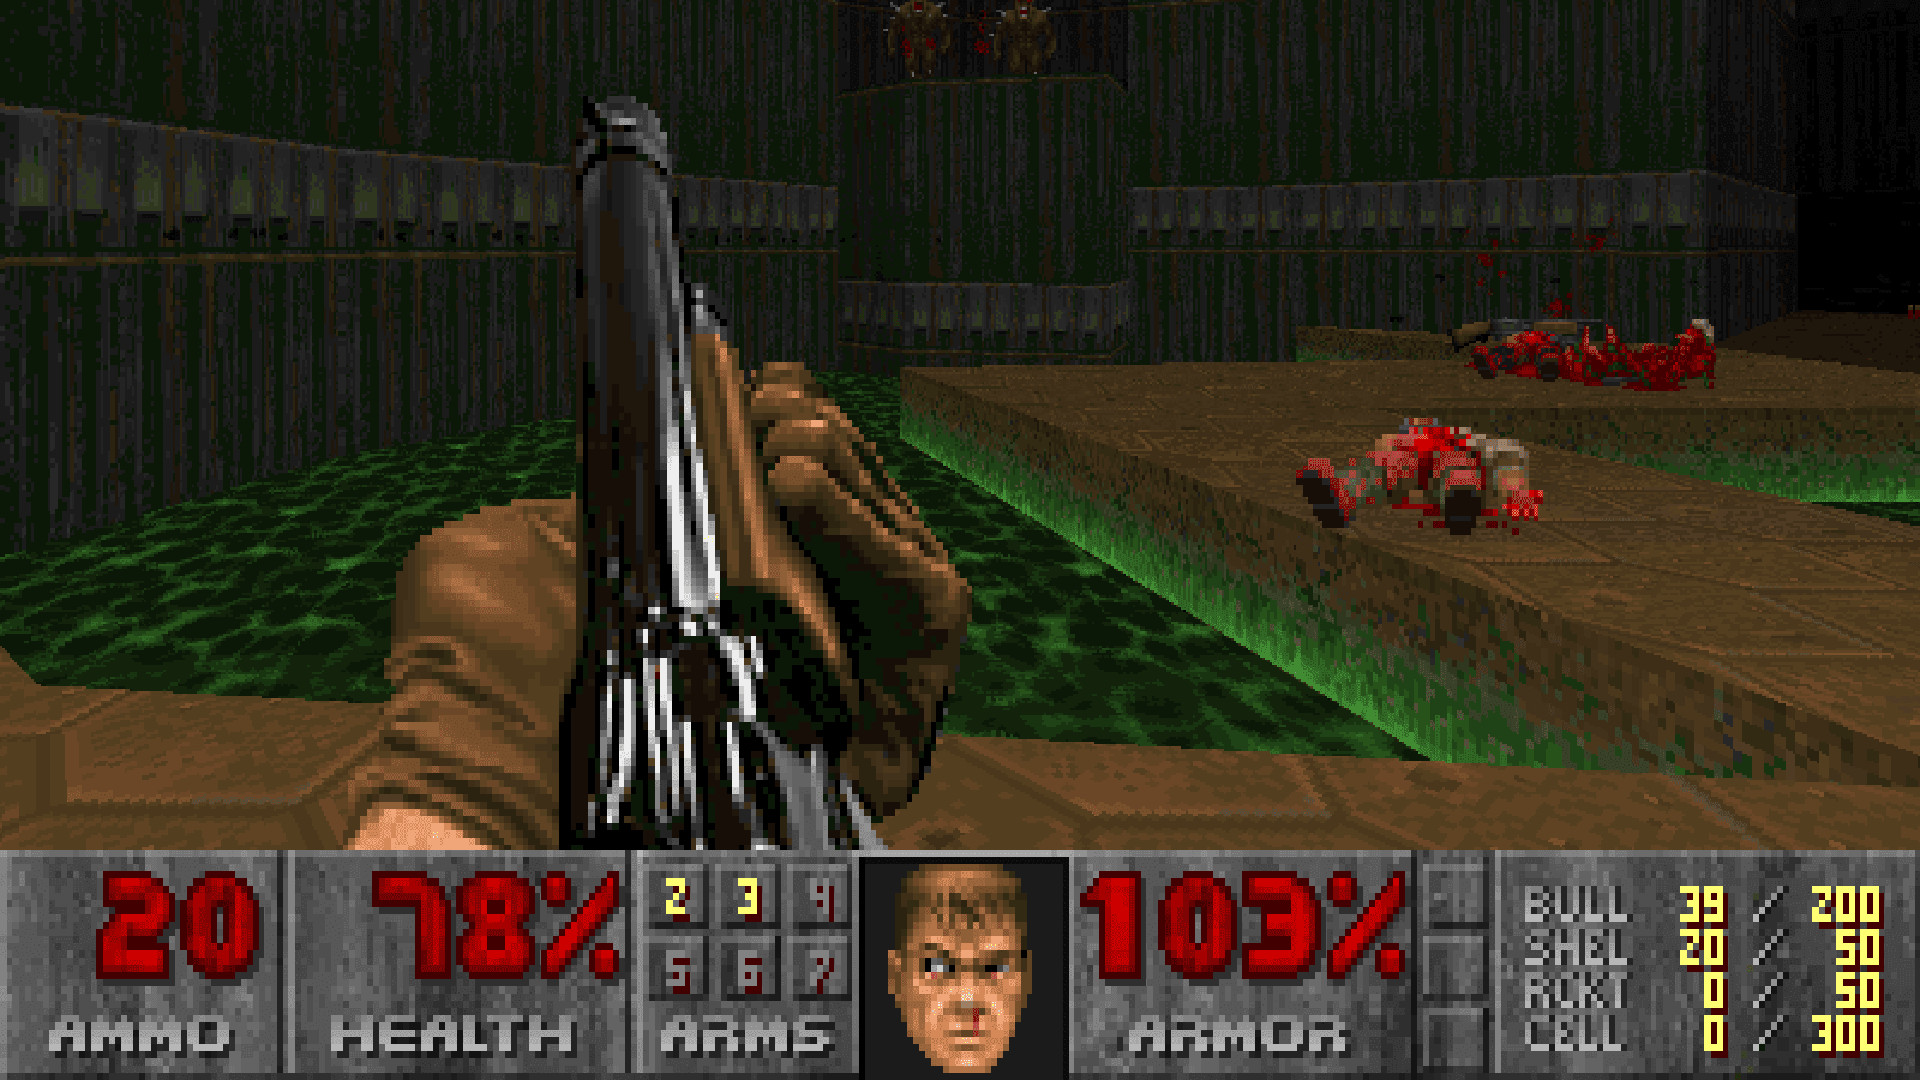 Bethesda removes mandatory login to play Doom and Doom 2